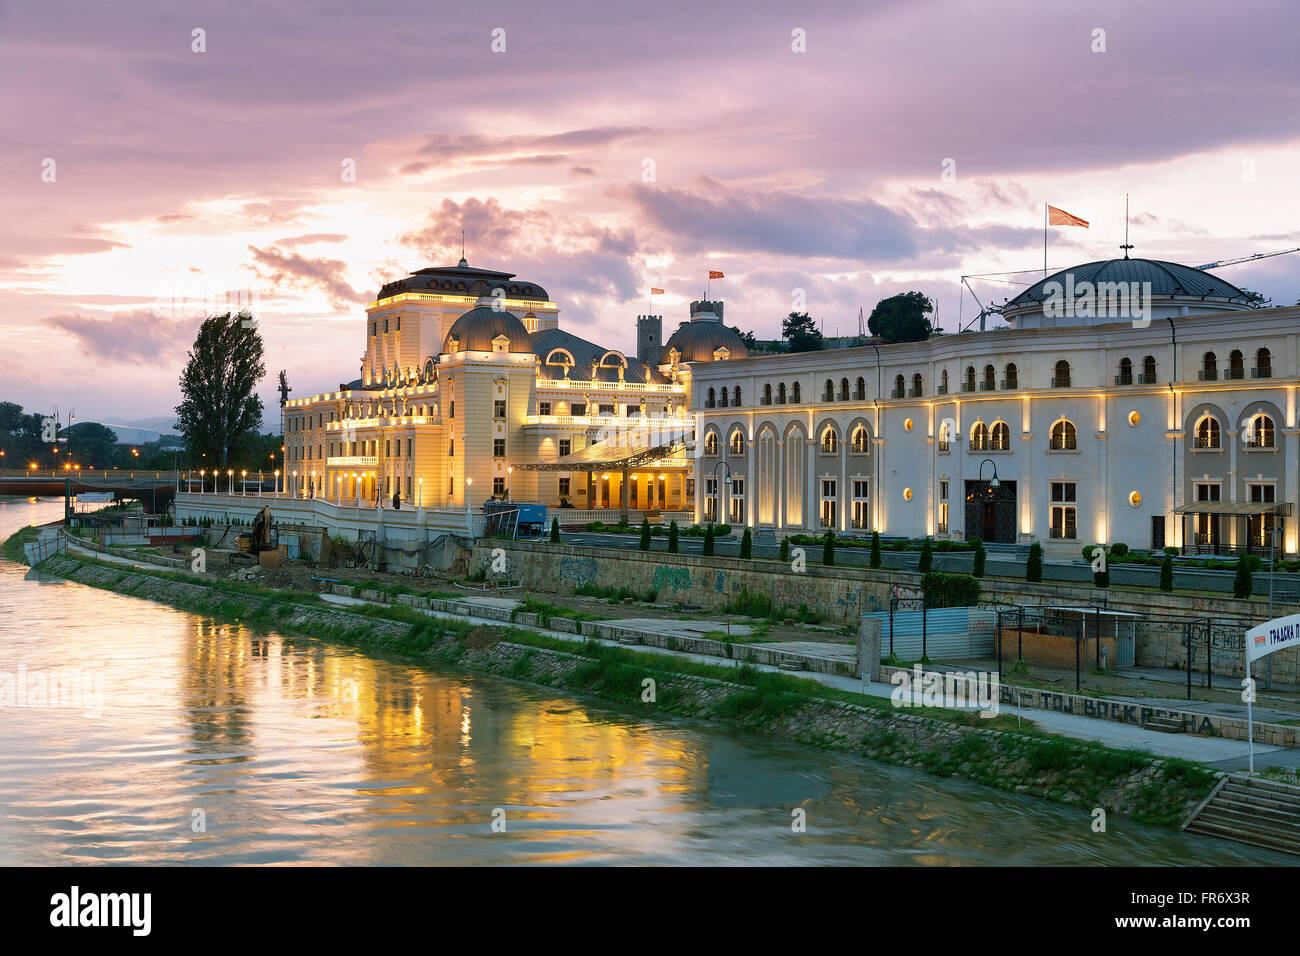 Republic of Macedonia, Skopje, district Carsija, Karpos square, the Macedonian Opera and Ballet - Stock Image